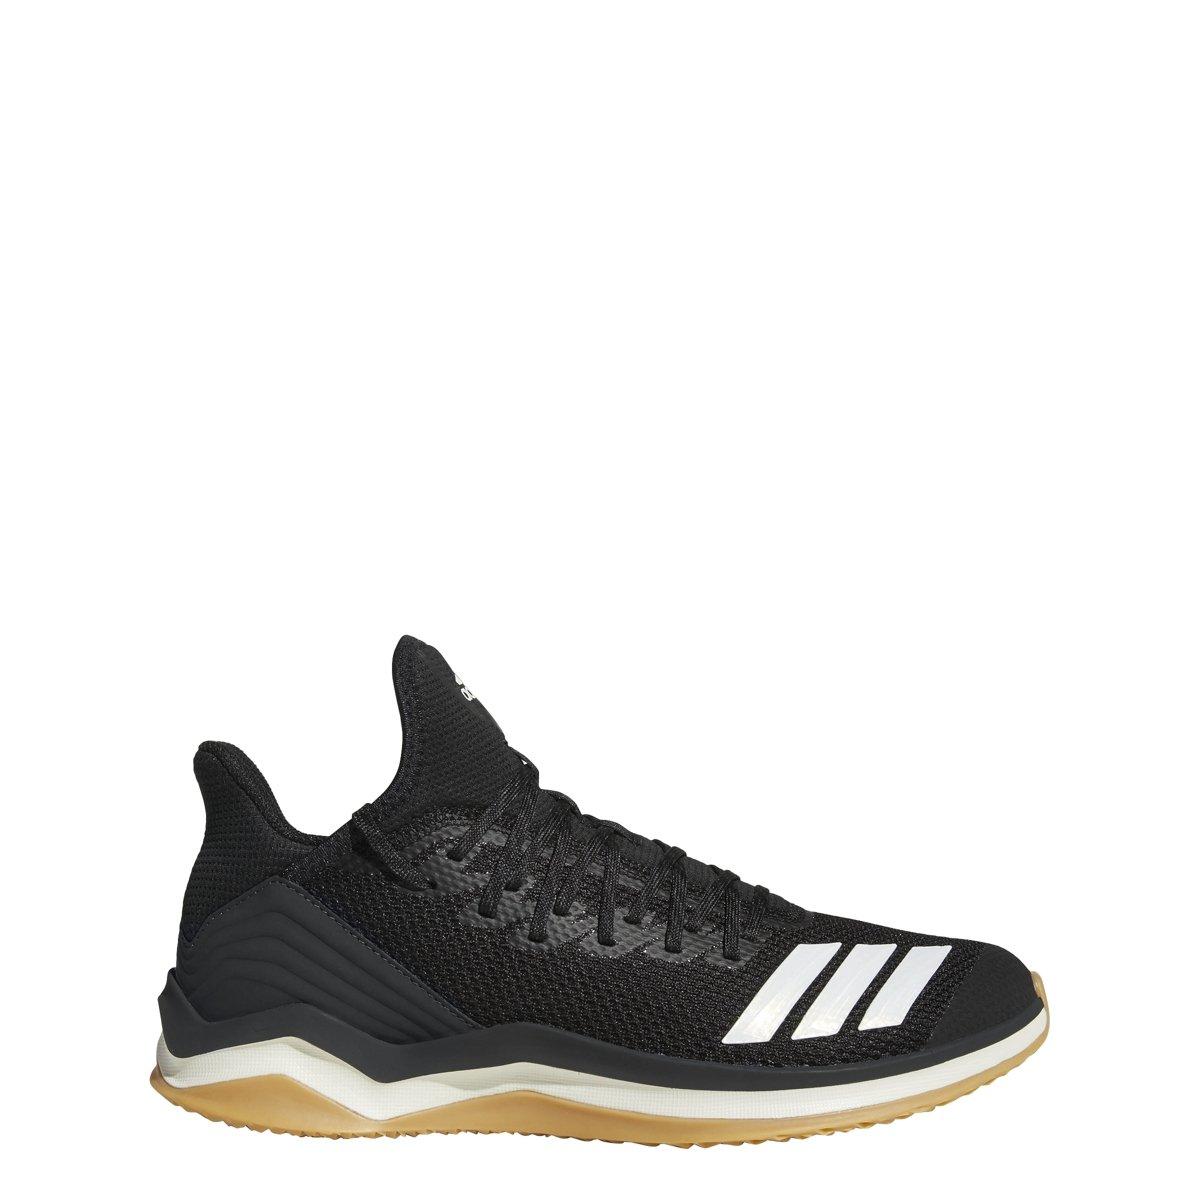 adidas performance uomini 'icona 4 baseball scarpa b077x8h7fw d (m) us